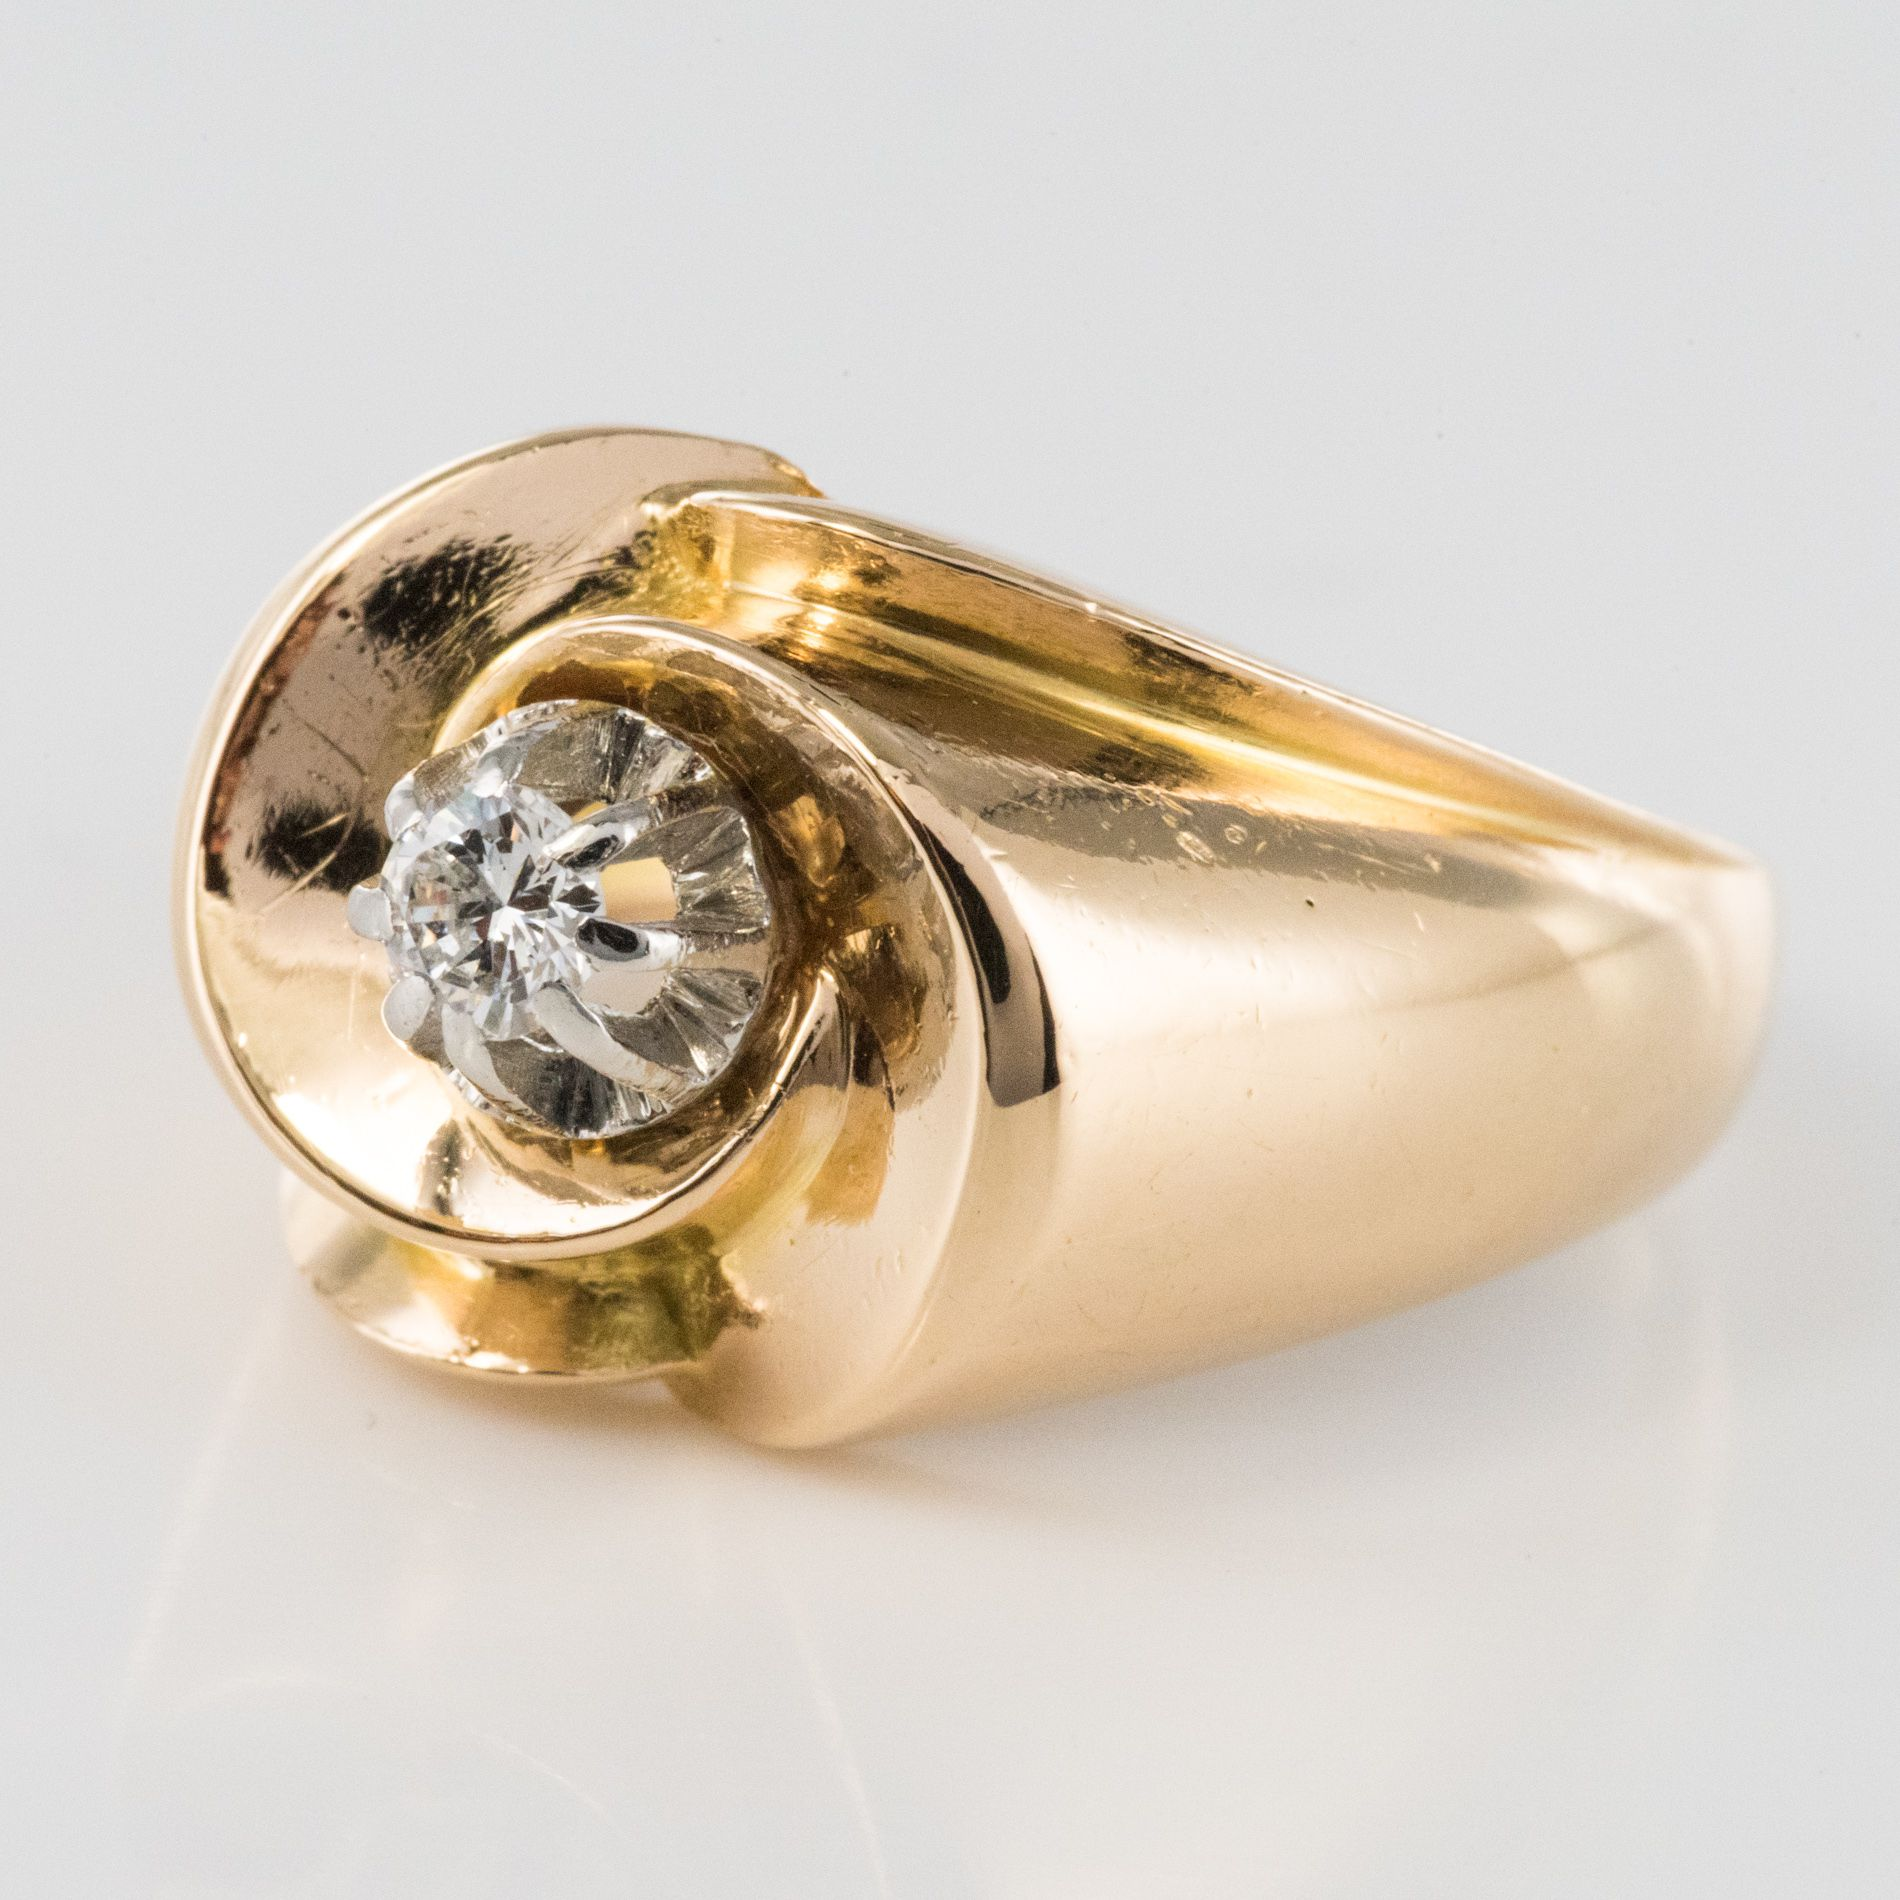 Bague ancienne or jaune diamant